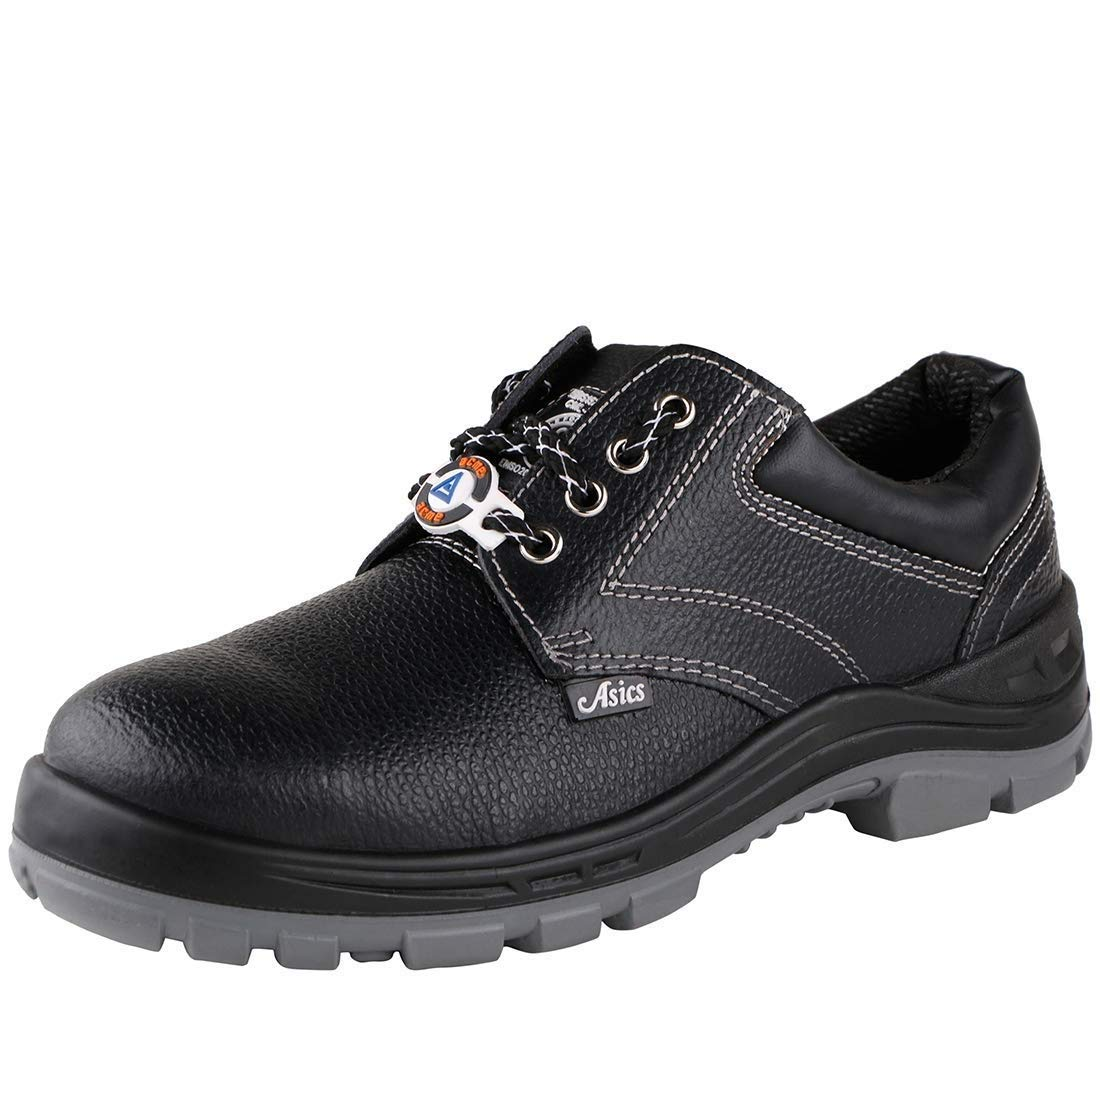 ACME Asics Leather Safety Shoes (45